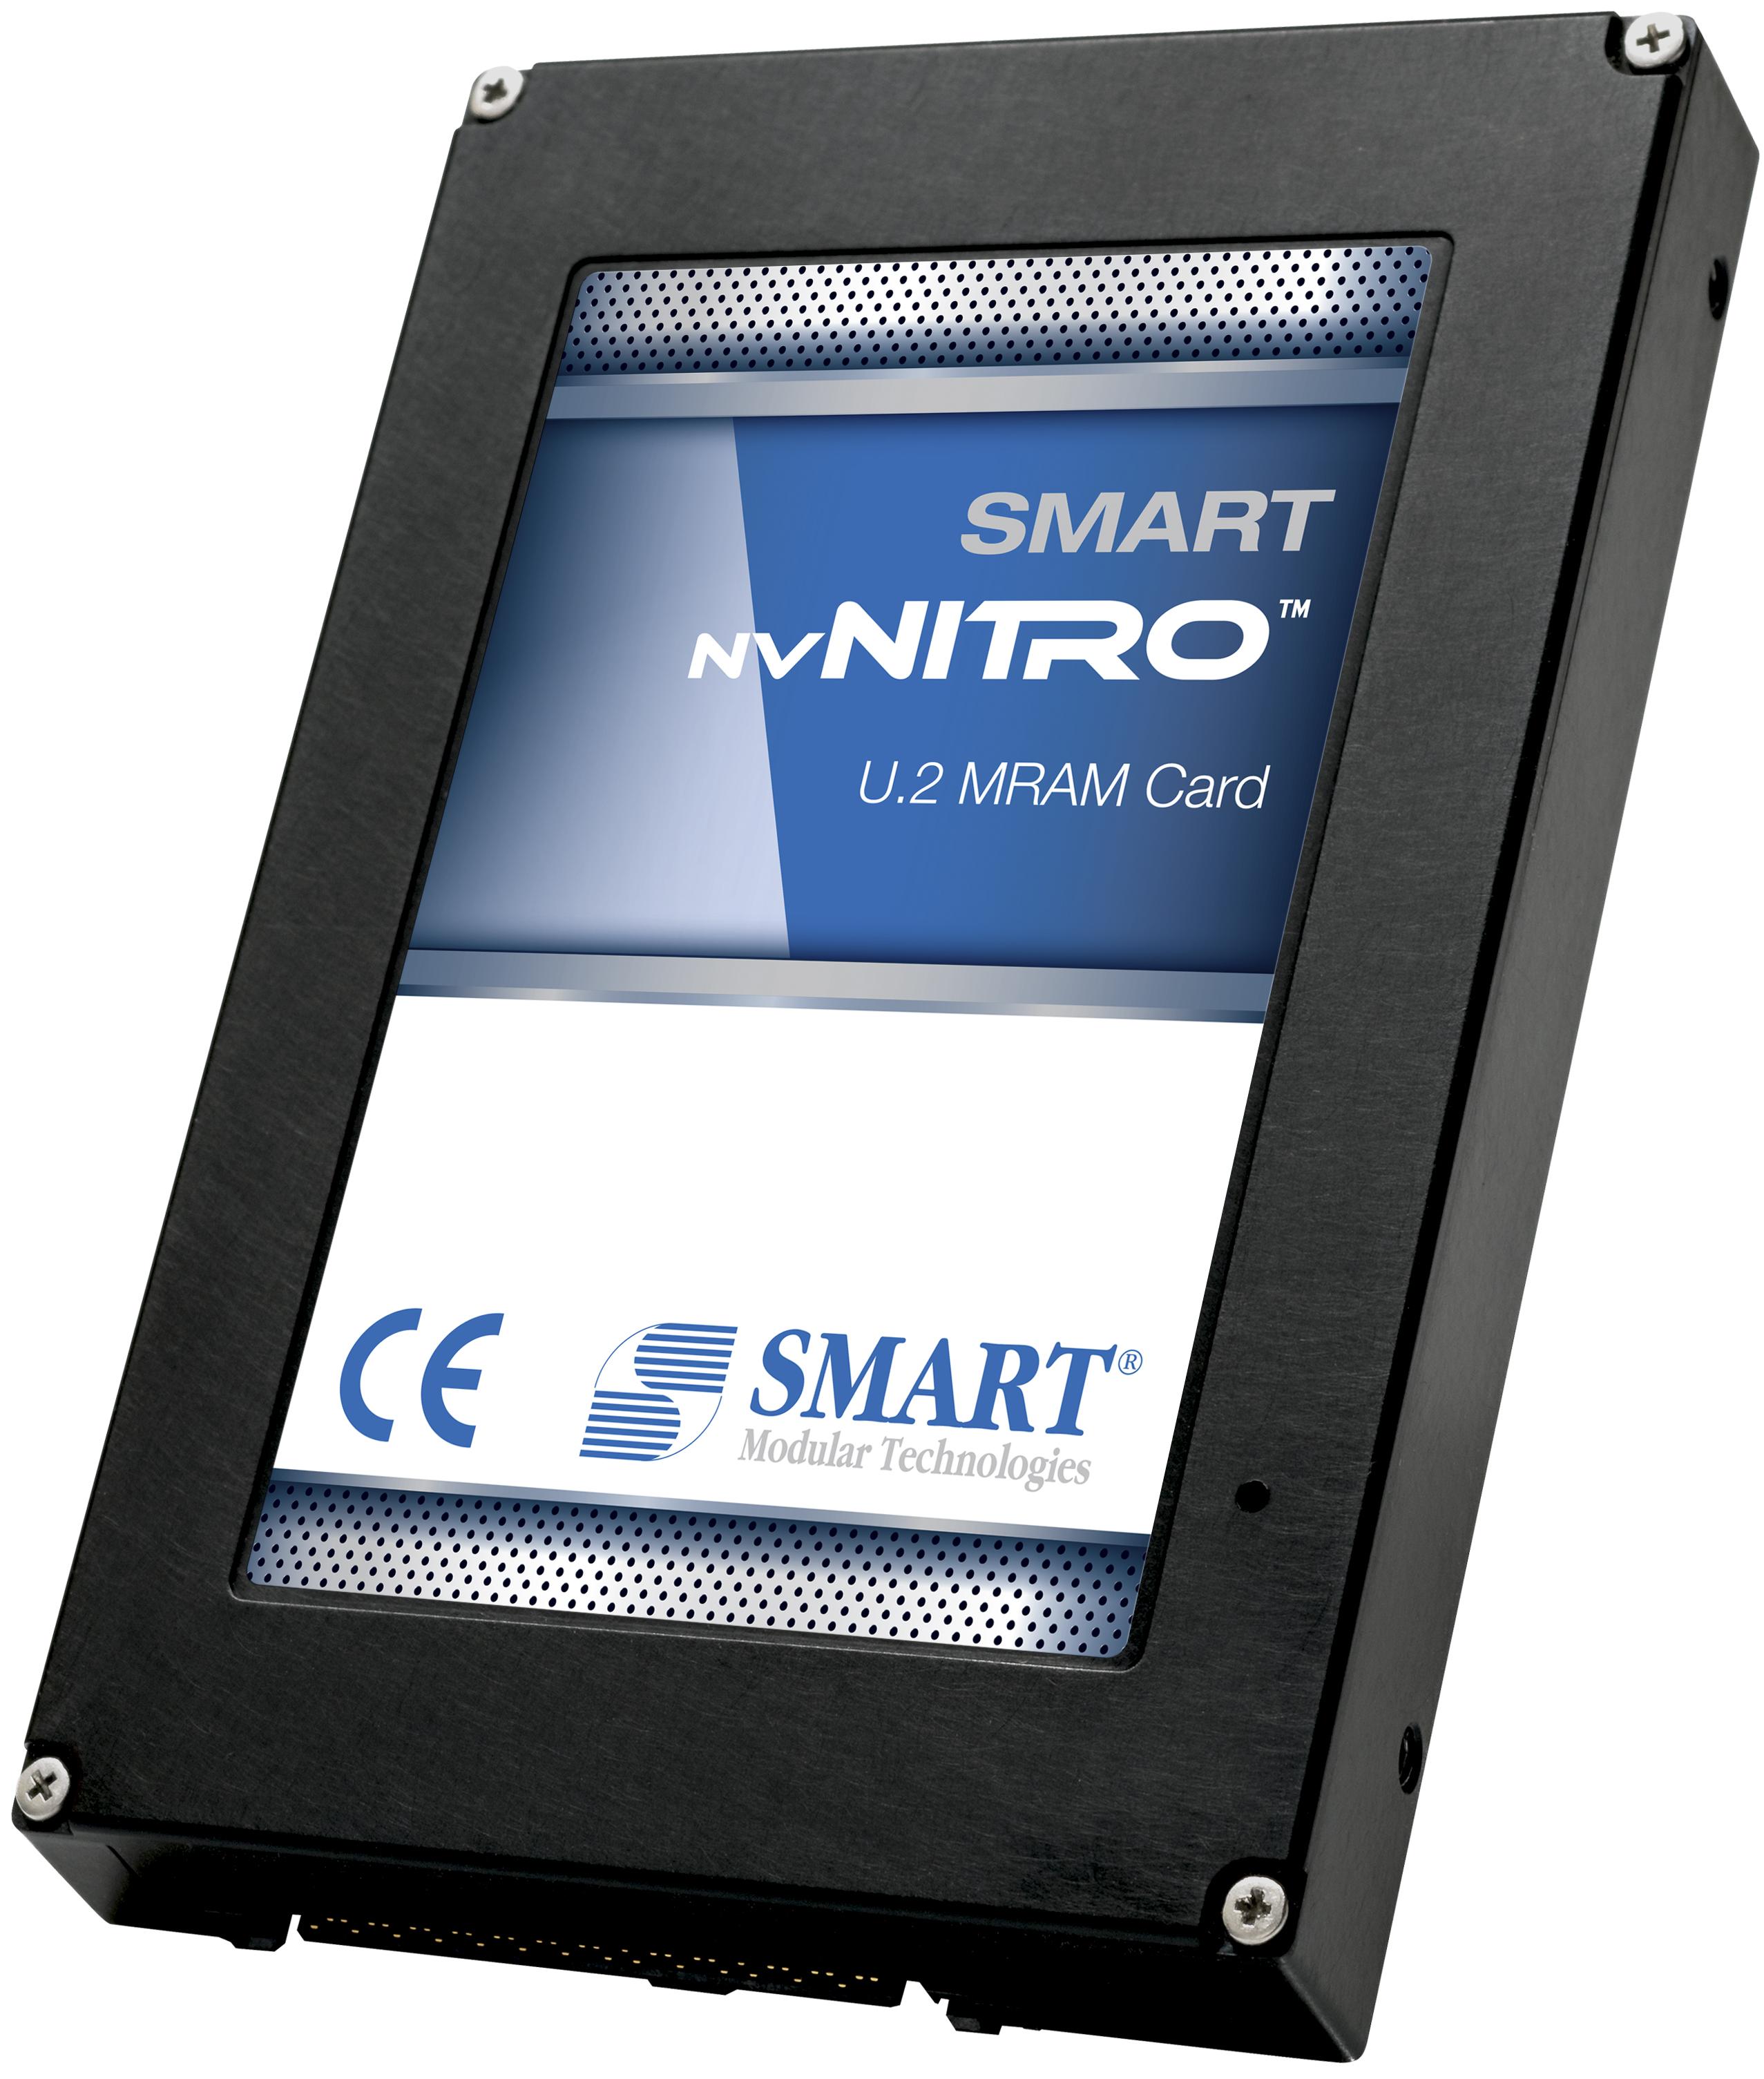 nvNITRO U.2 NVMe Storage Accelerator